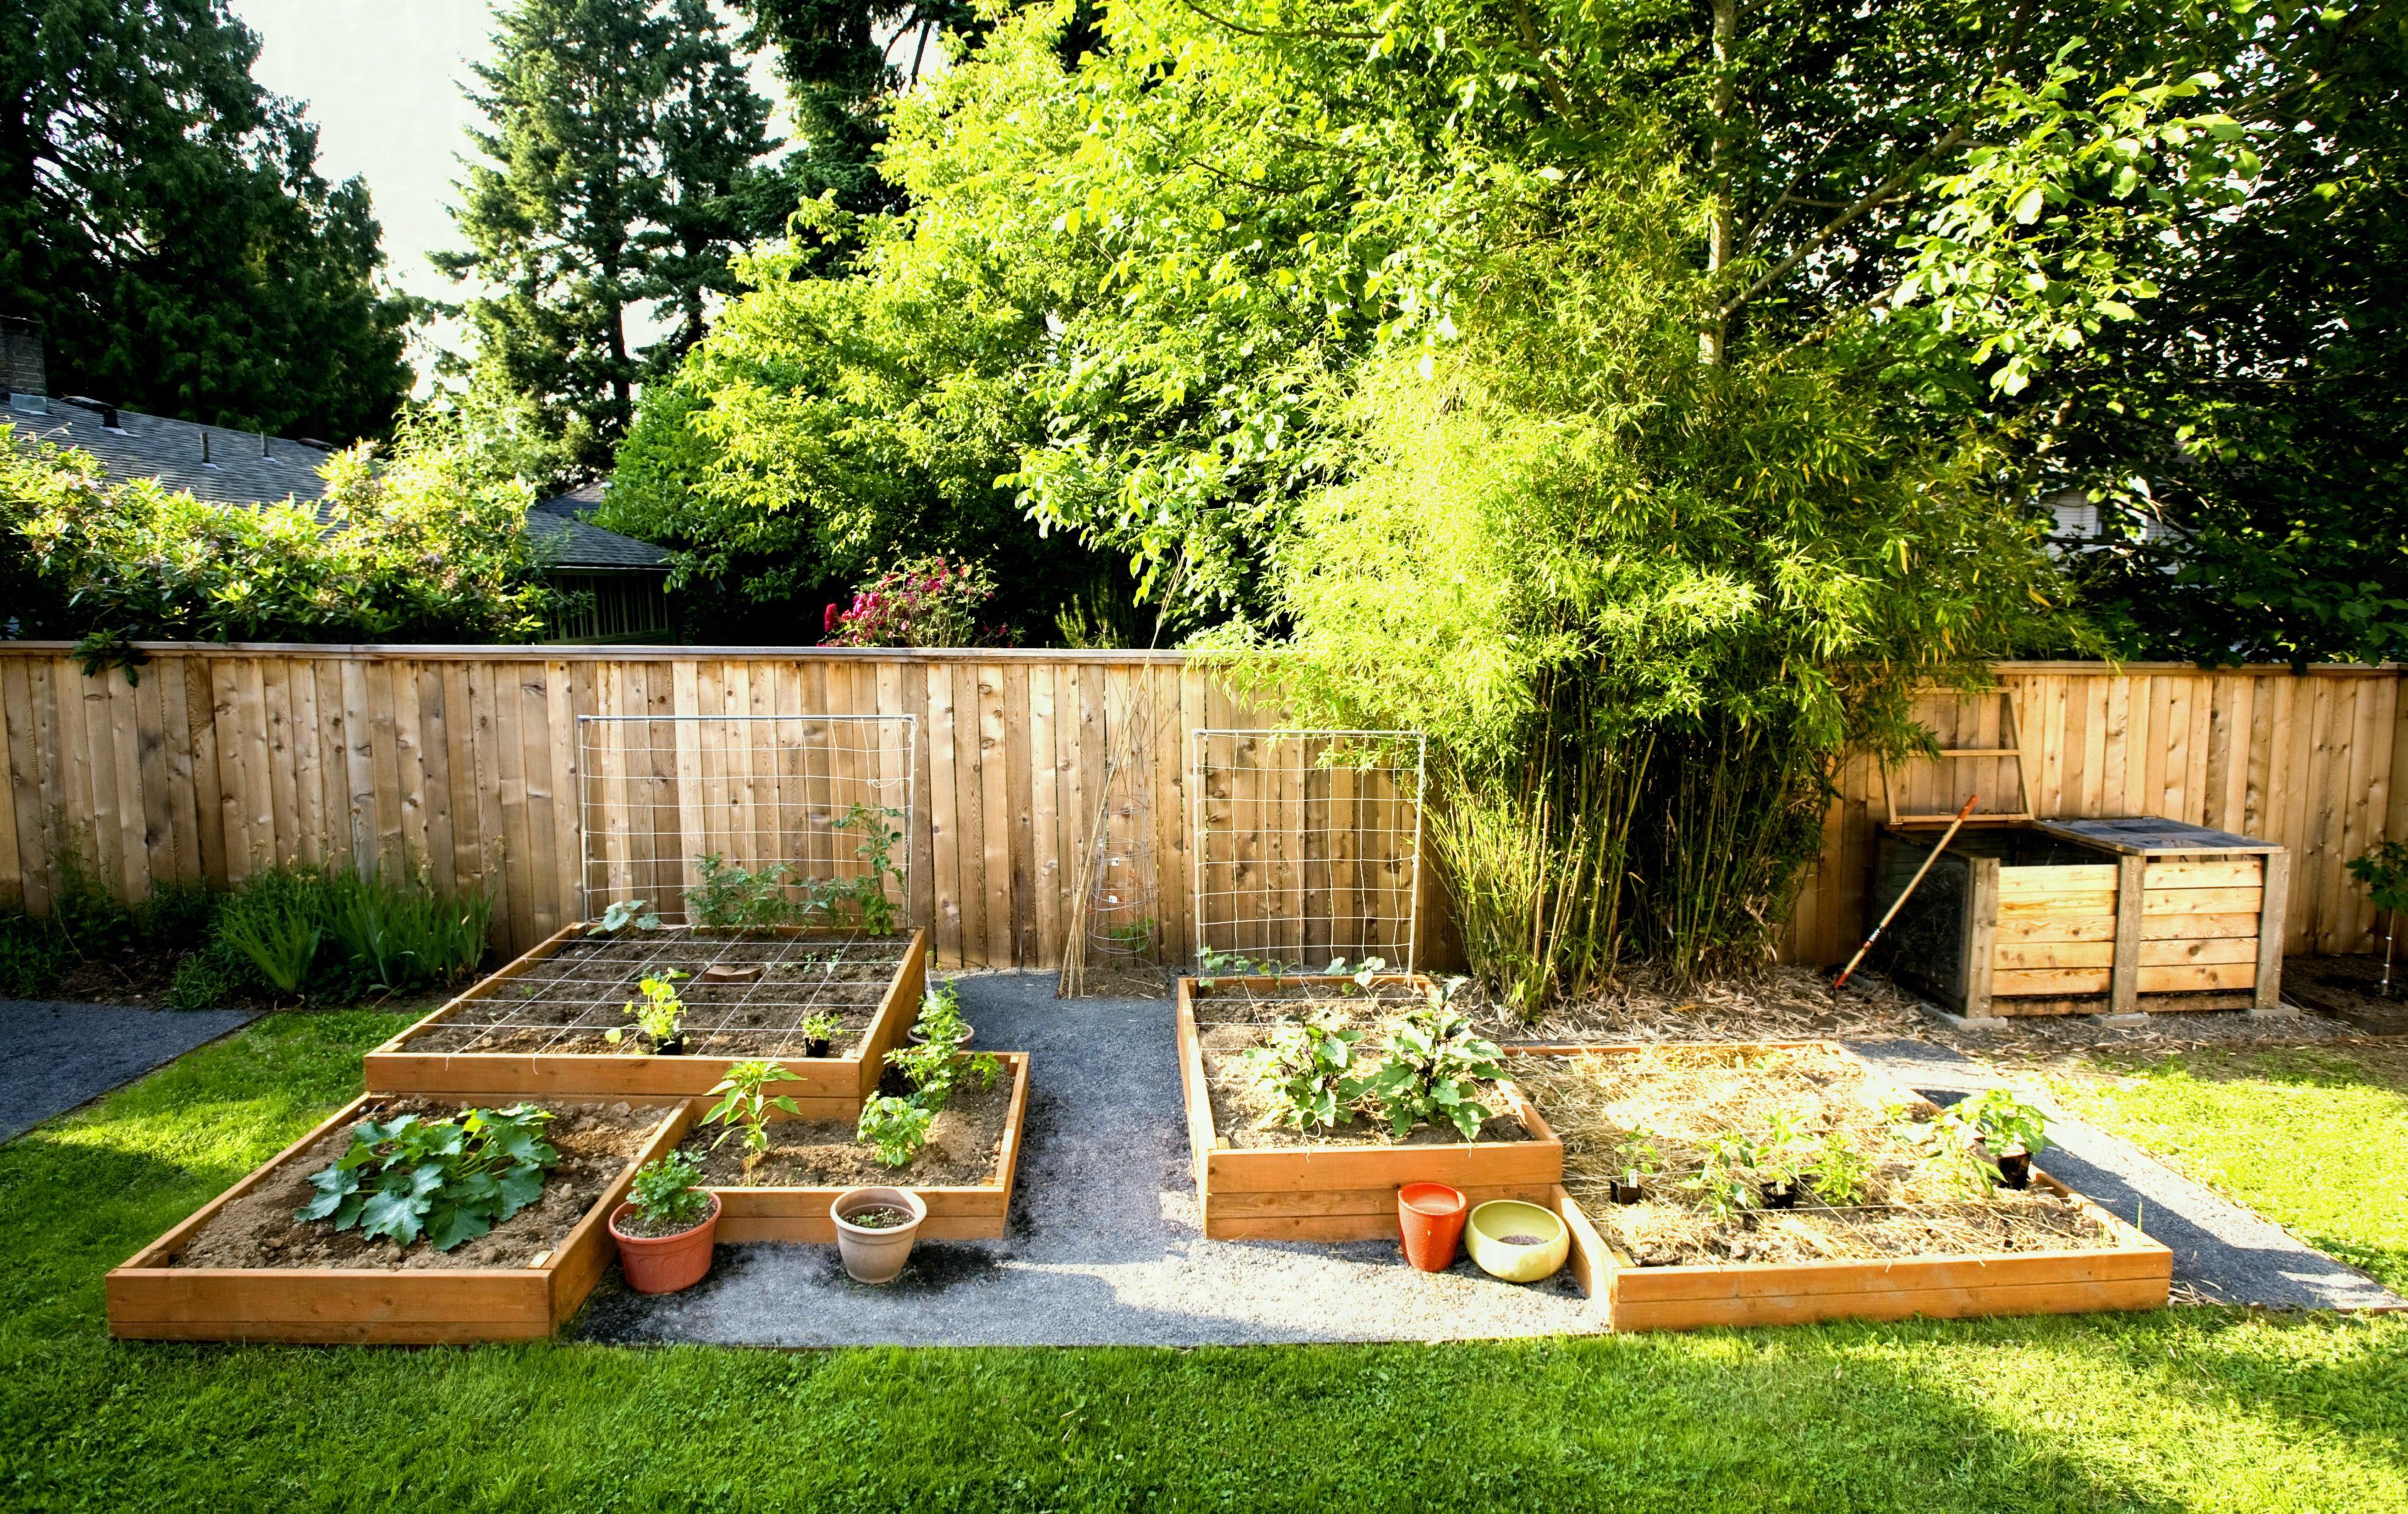 Brillian Creative Vegetable Garden Ideas Diy Backyard Landscaping Patio Landscaping Patio Landscaping Ideas On A Budget